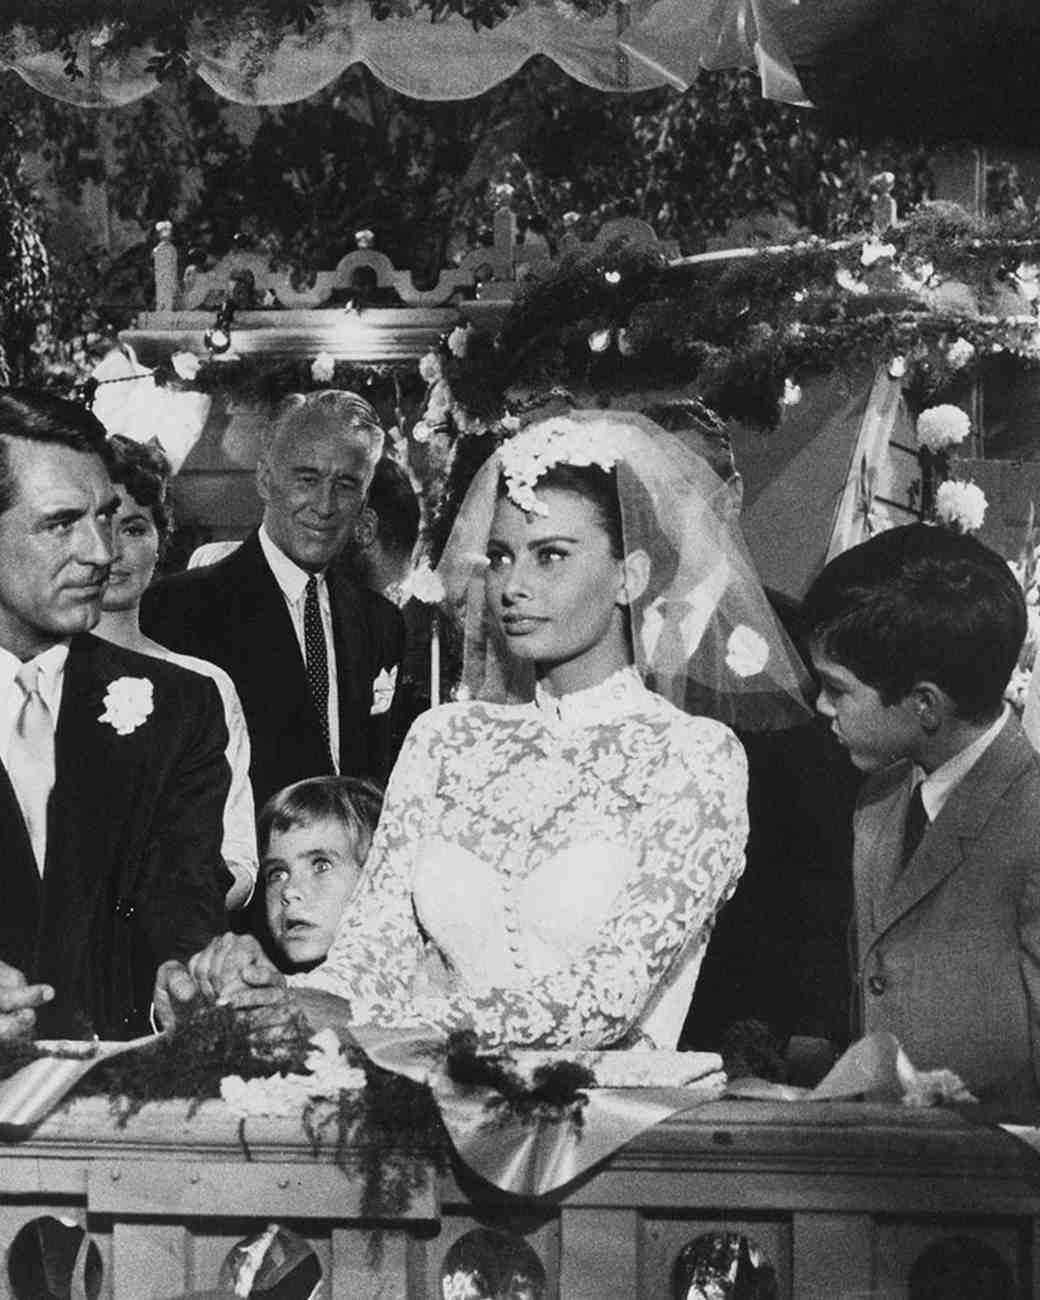 movie-wedding-dresses-houseboat-sophia-loren-0316.jpg